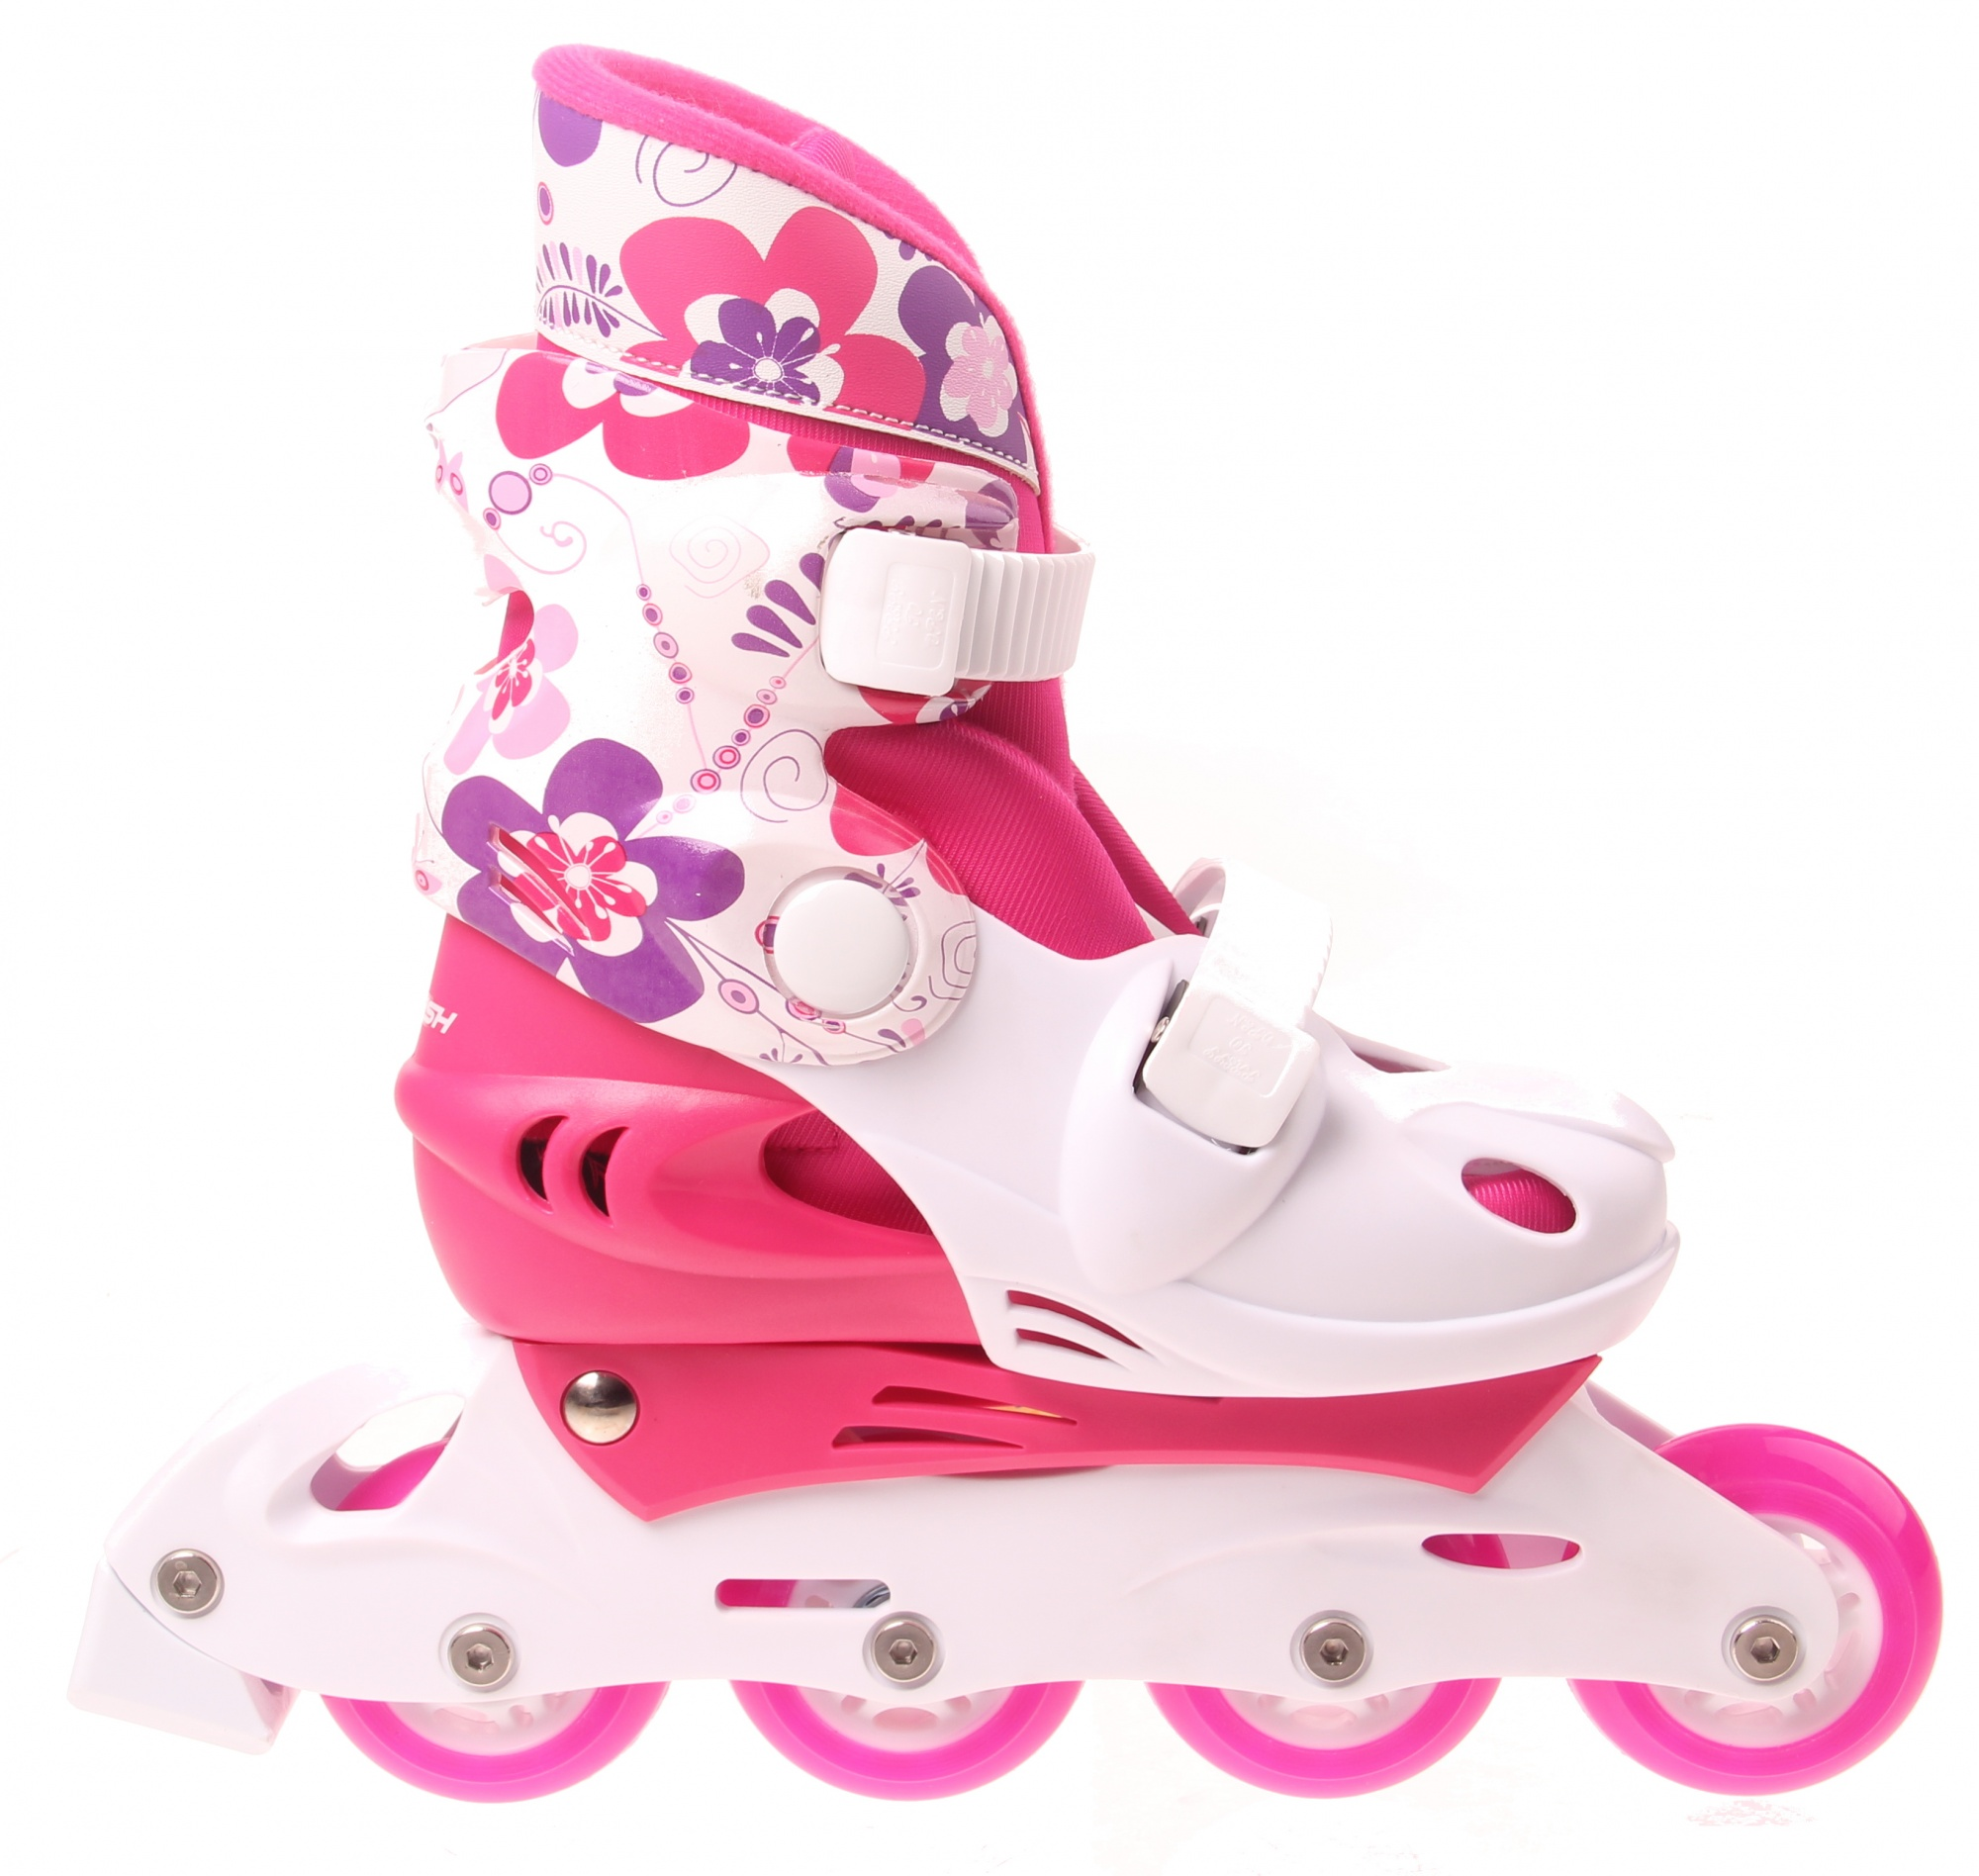 dcd70dc772e Tempish skateset Blume junior weiß / pink - Internet-Sport&Casuals